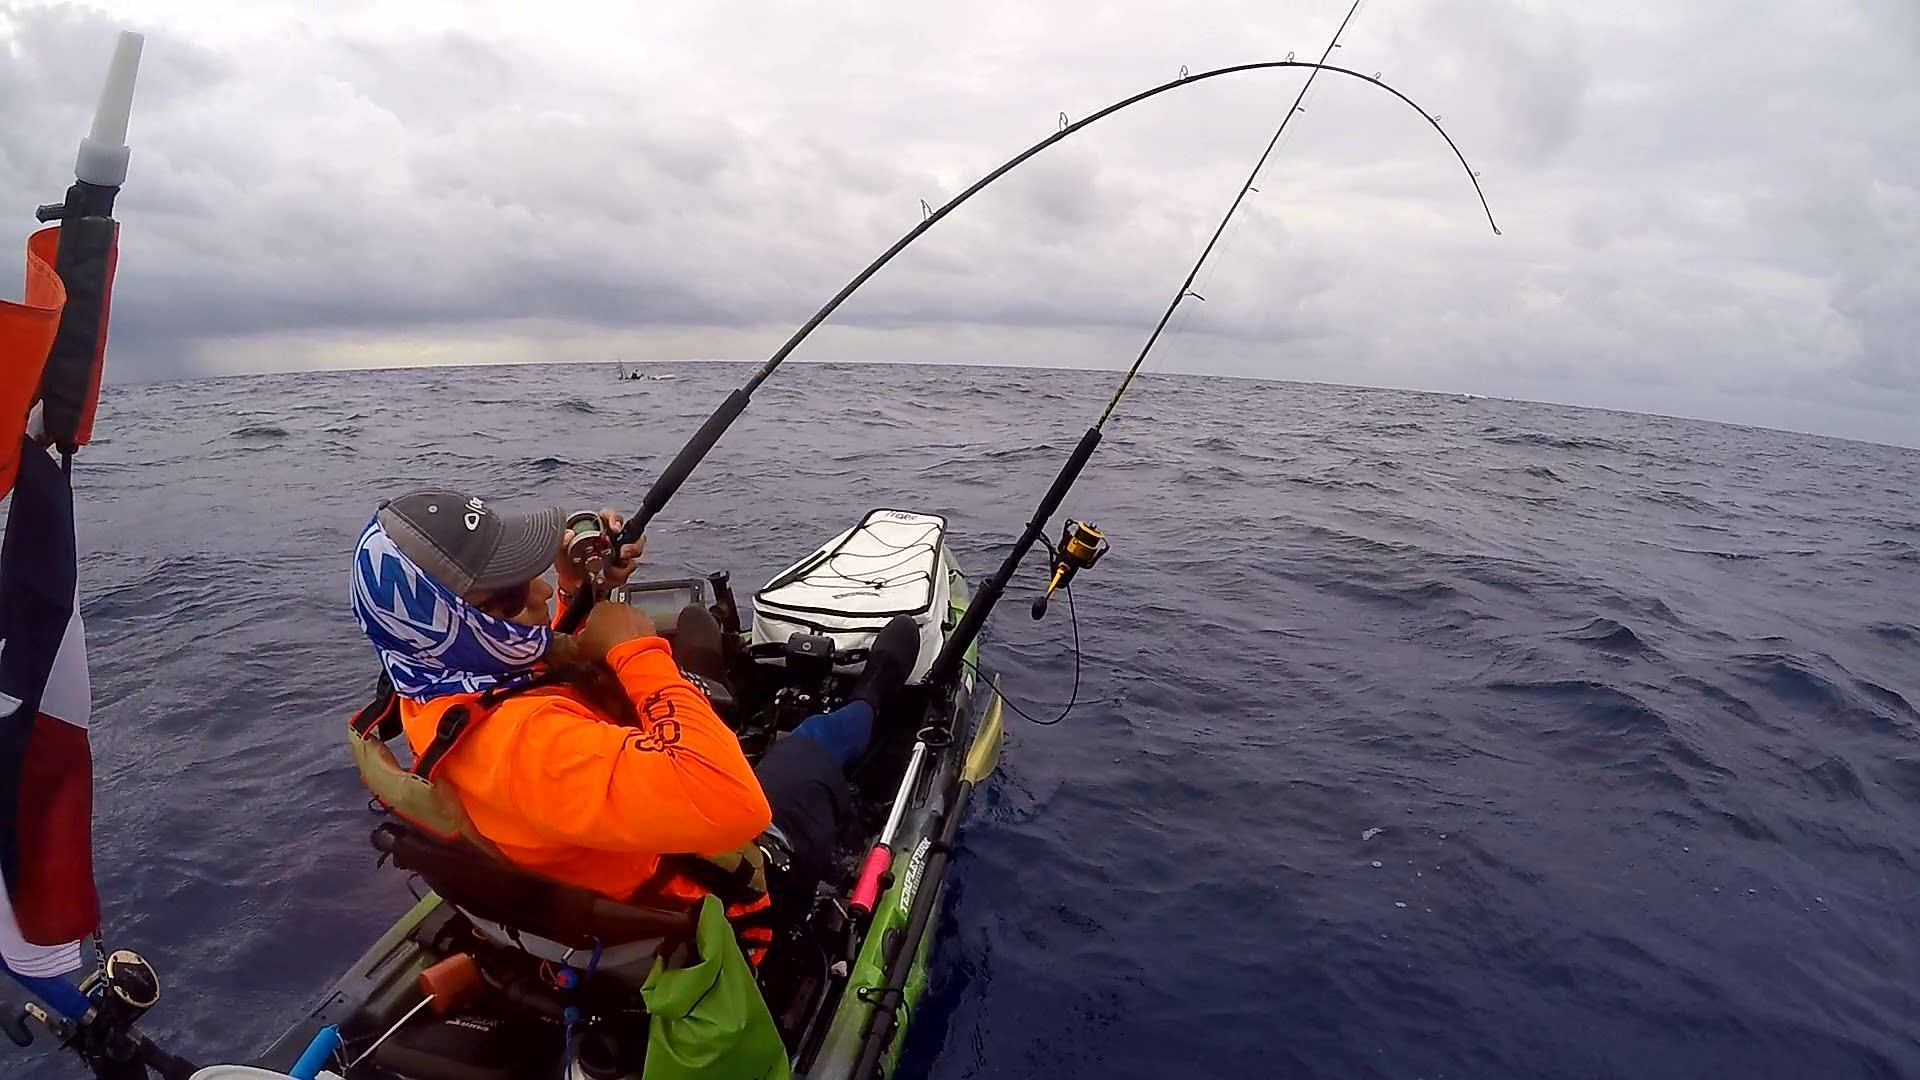 Bahamas to bastrop eugene mora iii yakattack for Kayak bass fishing tournaments